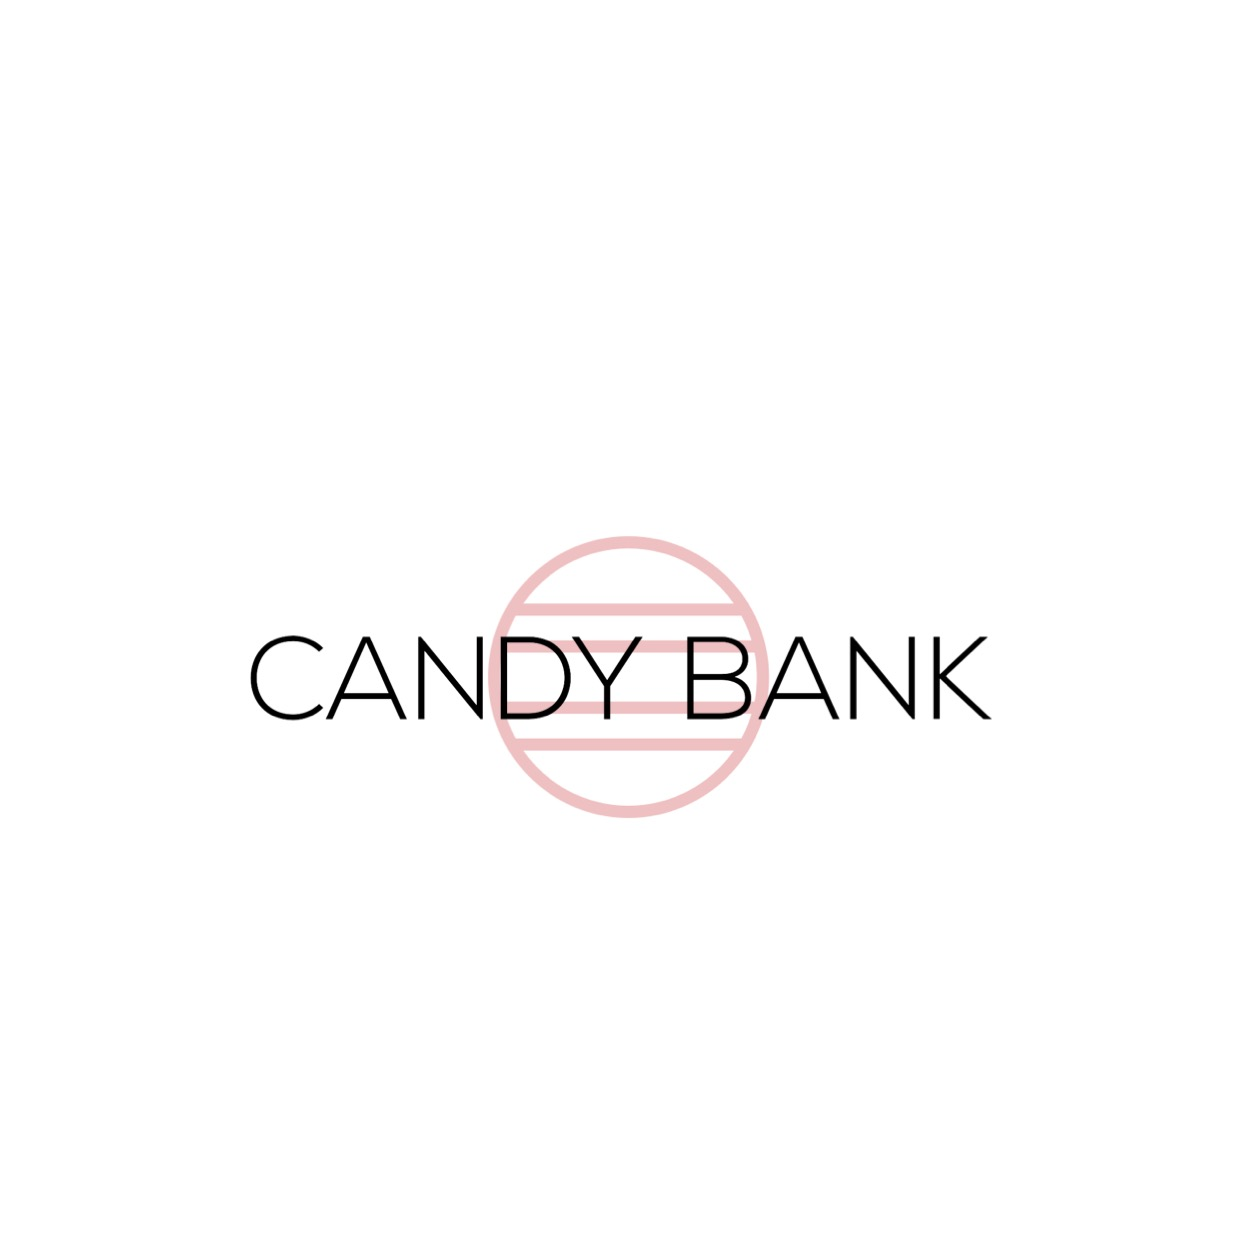 Логотип для международного банка фото f_6415d6bfe7e1aaa1.jpg